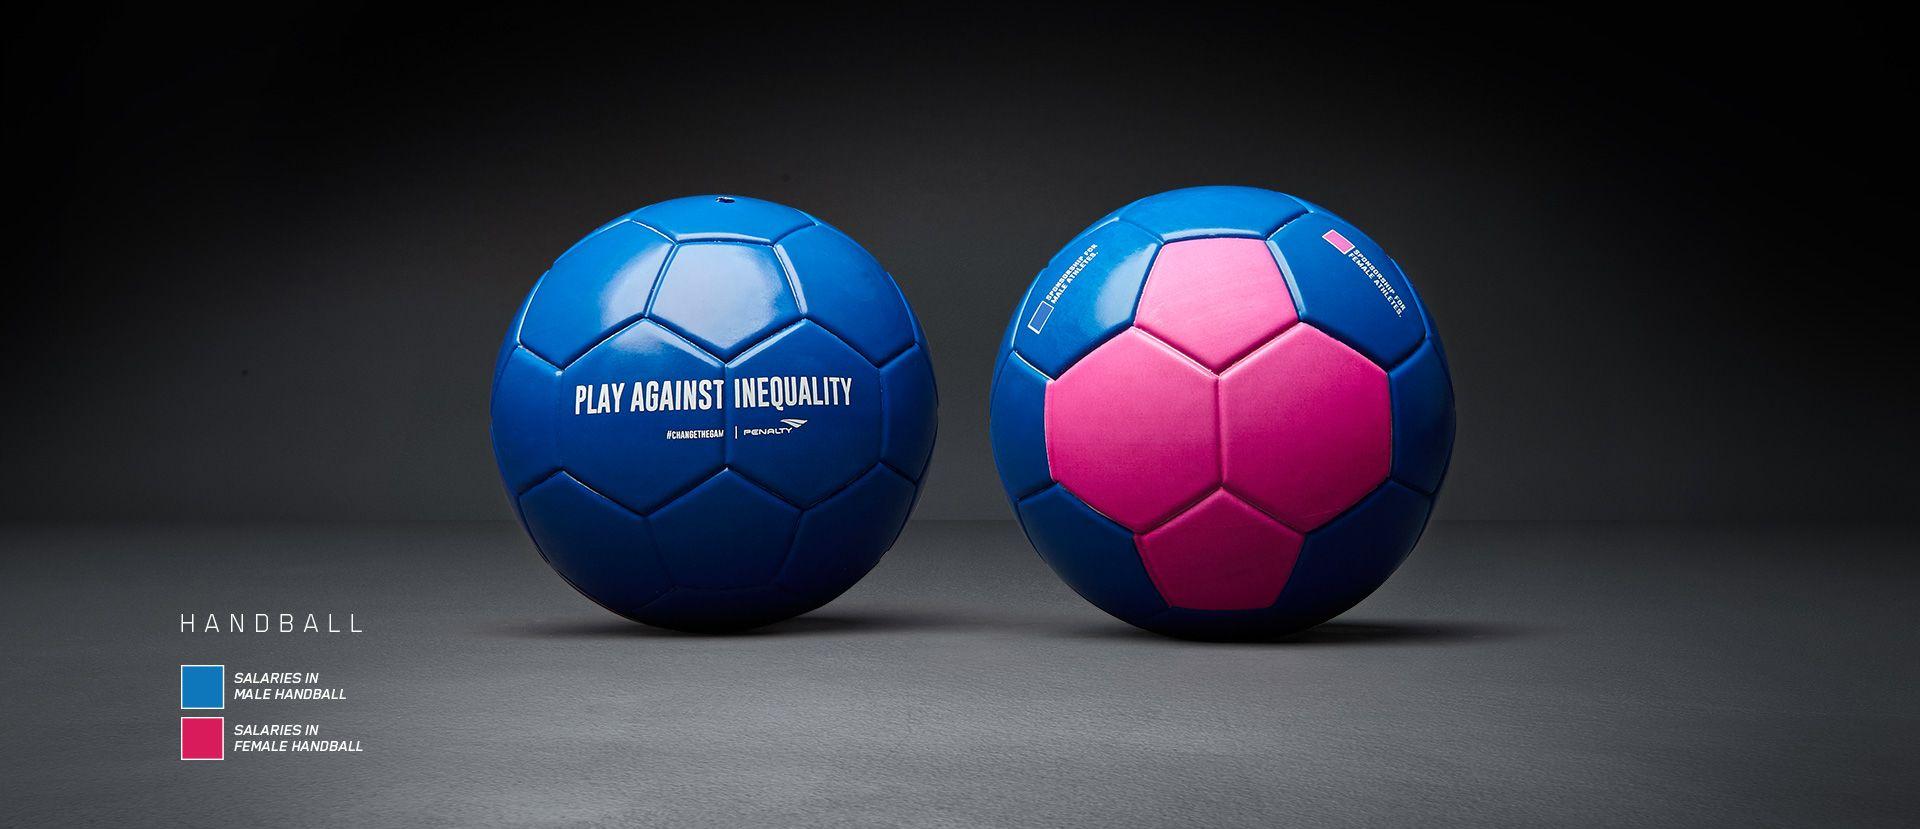 inequality balls_espnW_africa_brezilya_bigumigu_5